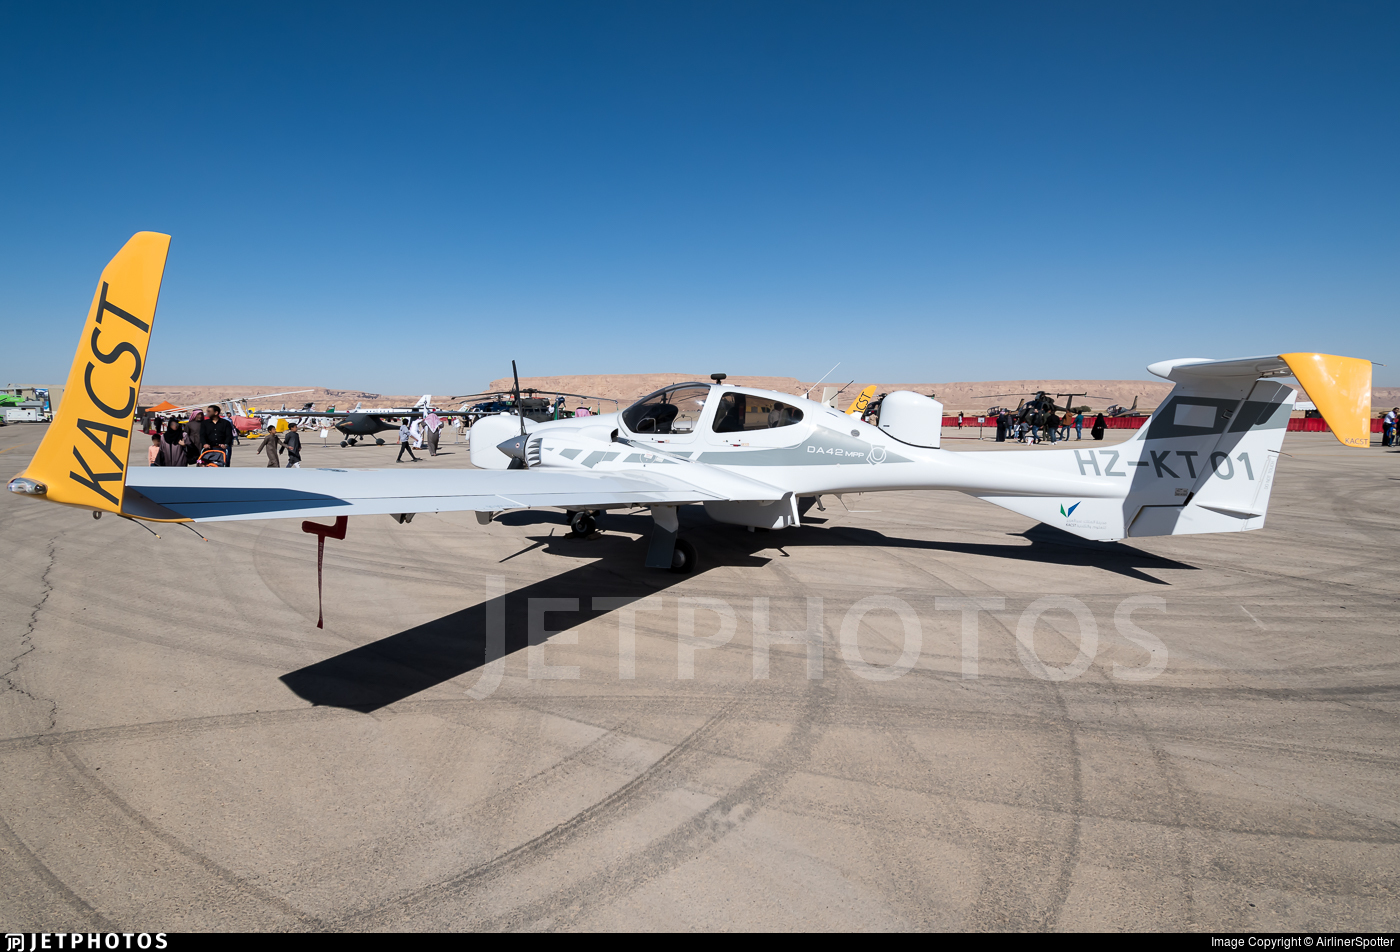 HZ-KT01 - Diamond DA-42 MPP - King Abdulaziz City of Science and Technology (KACST)